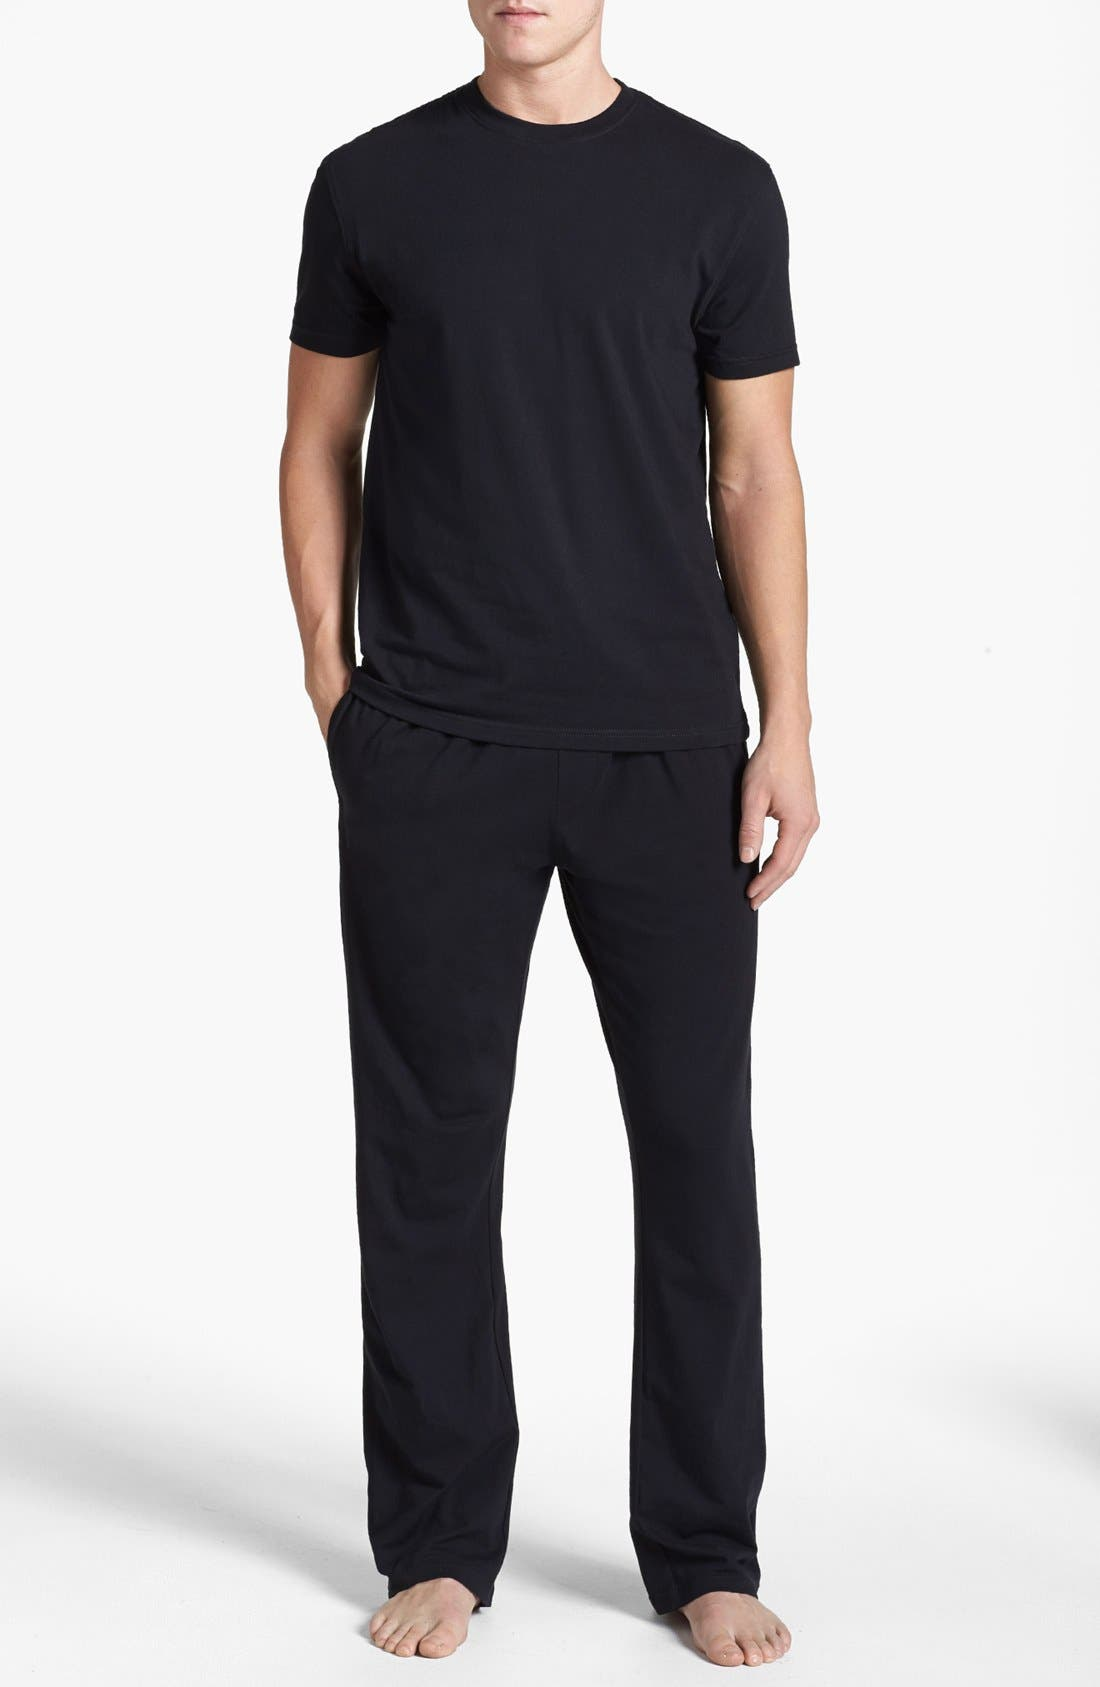 Main Image - Nordstrom Stretch Cotton Pajama Set